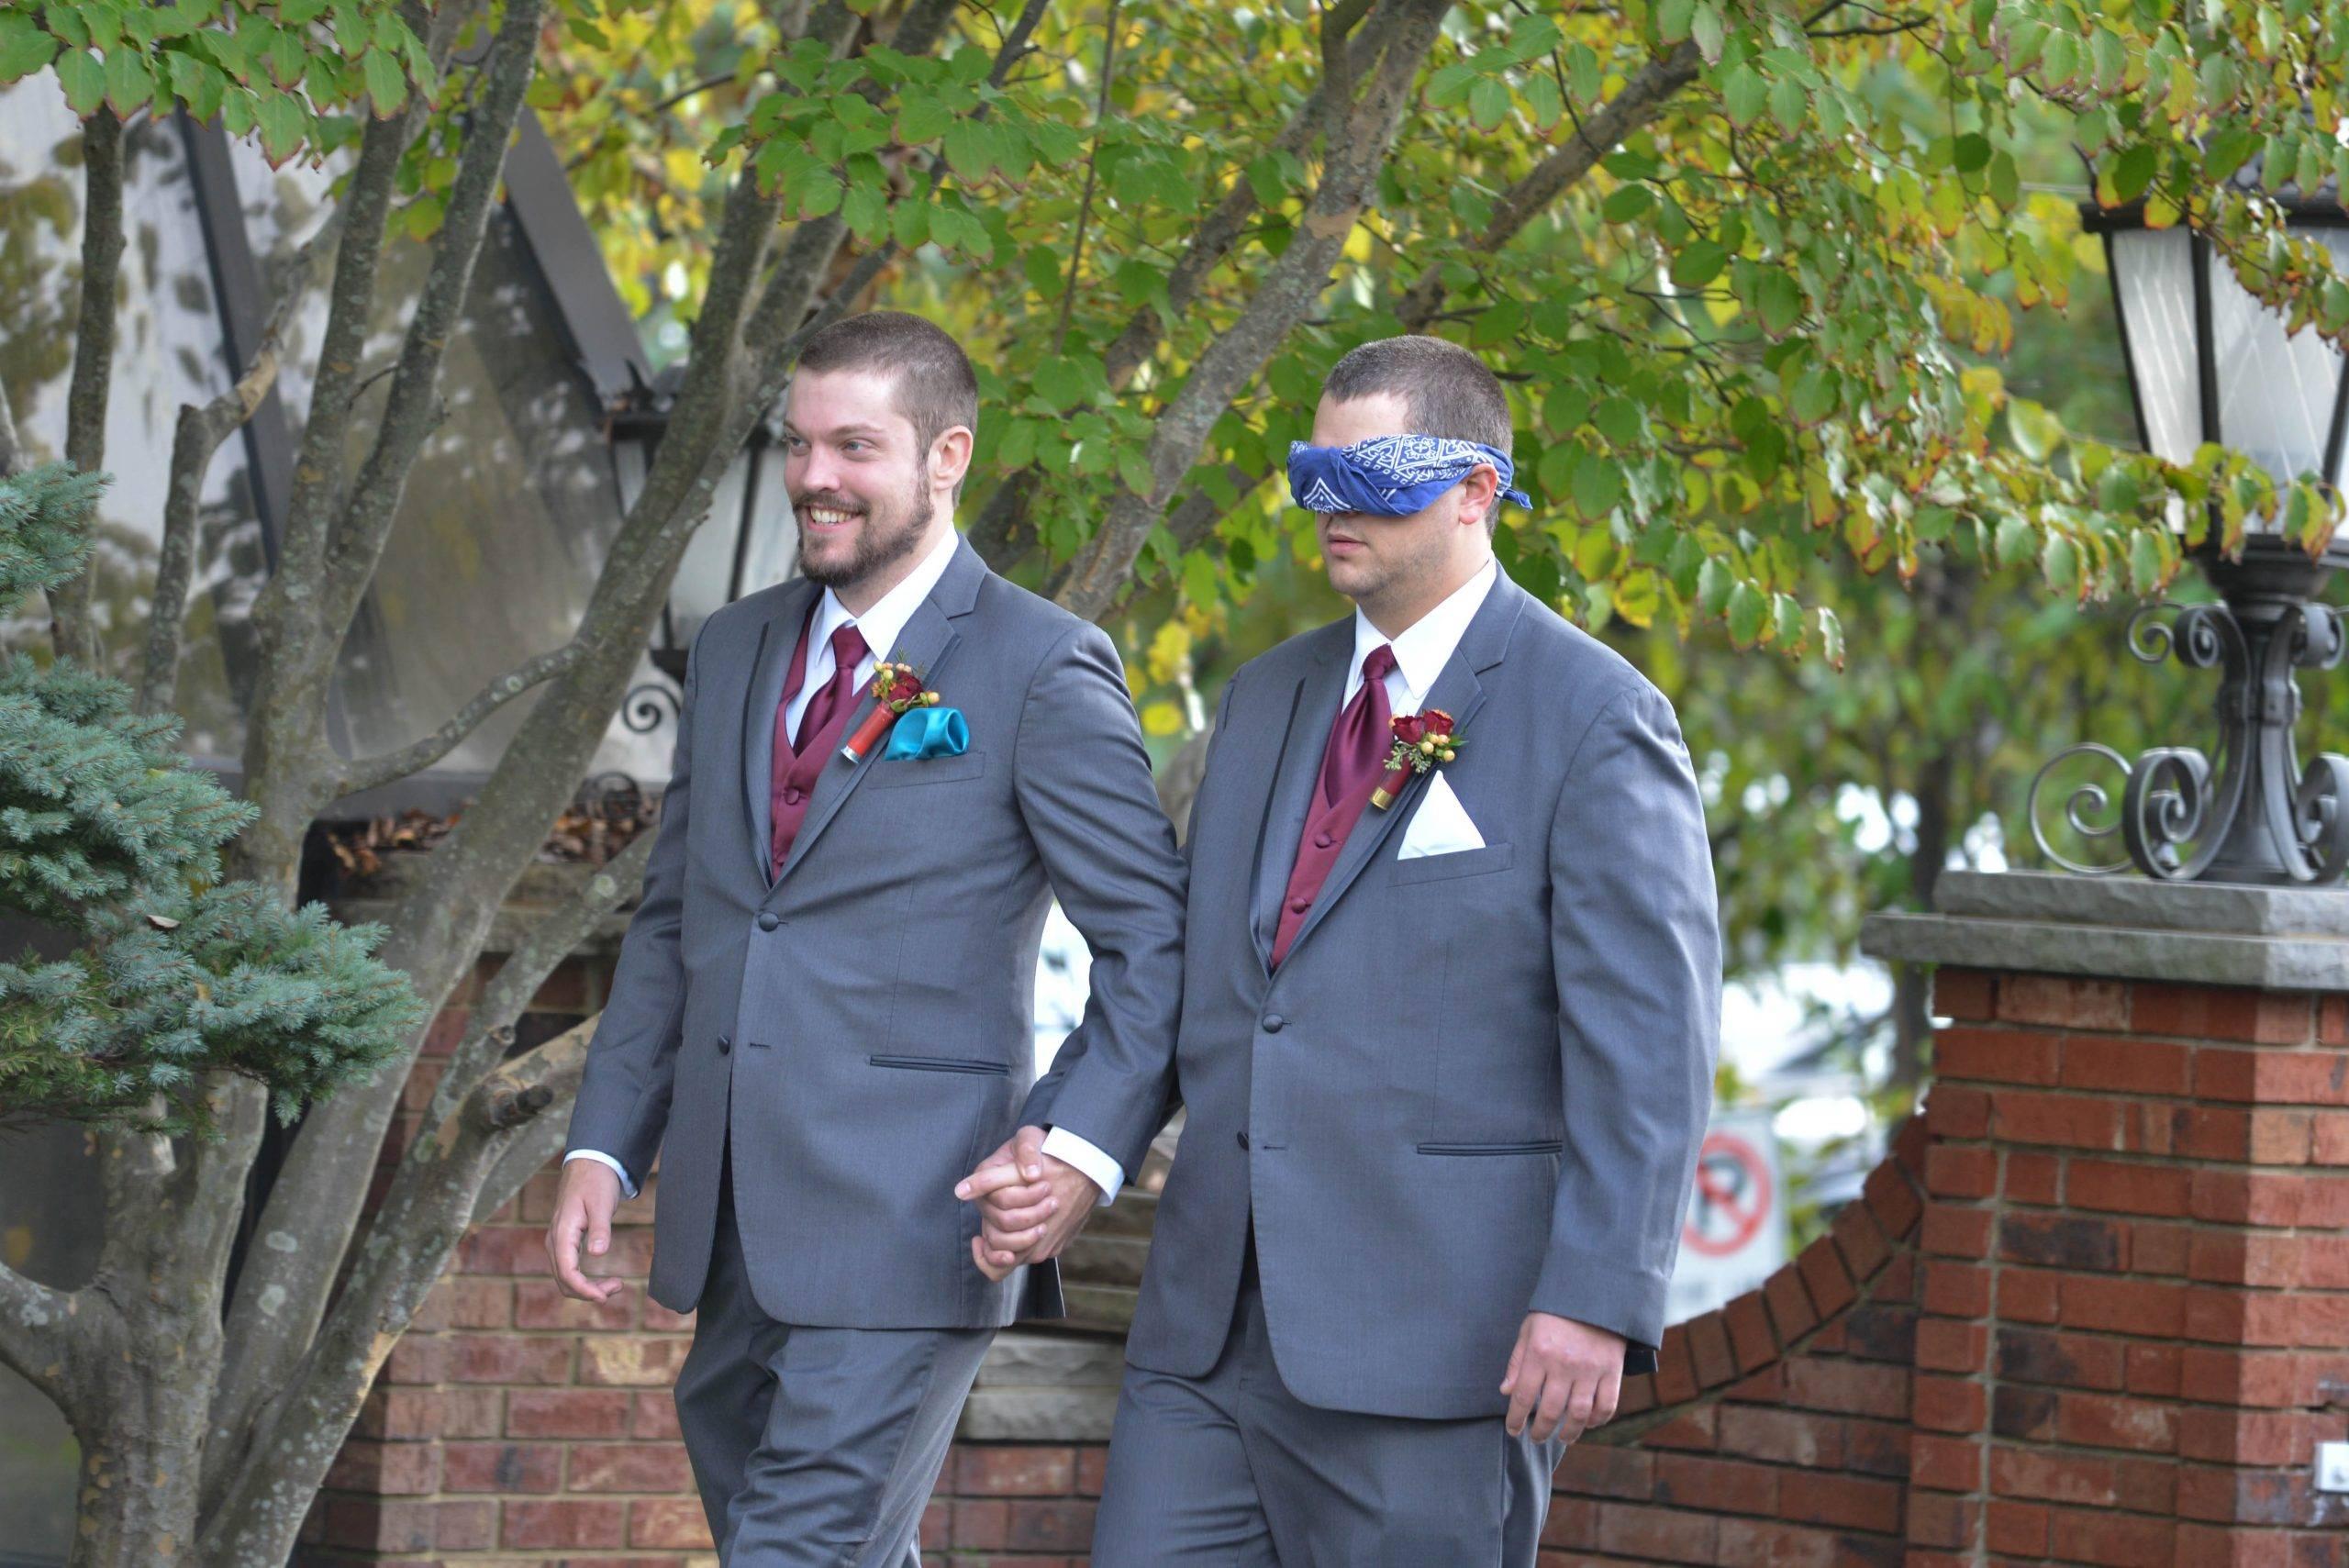 Birchwood Manor groom